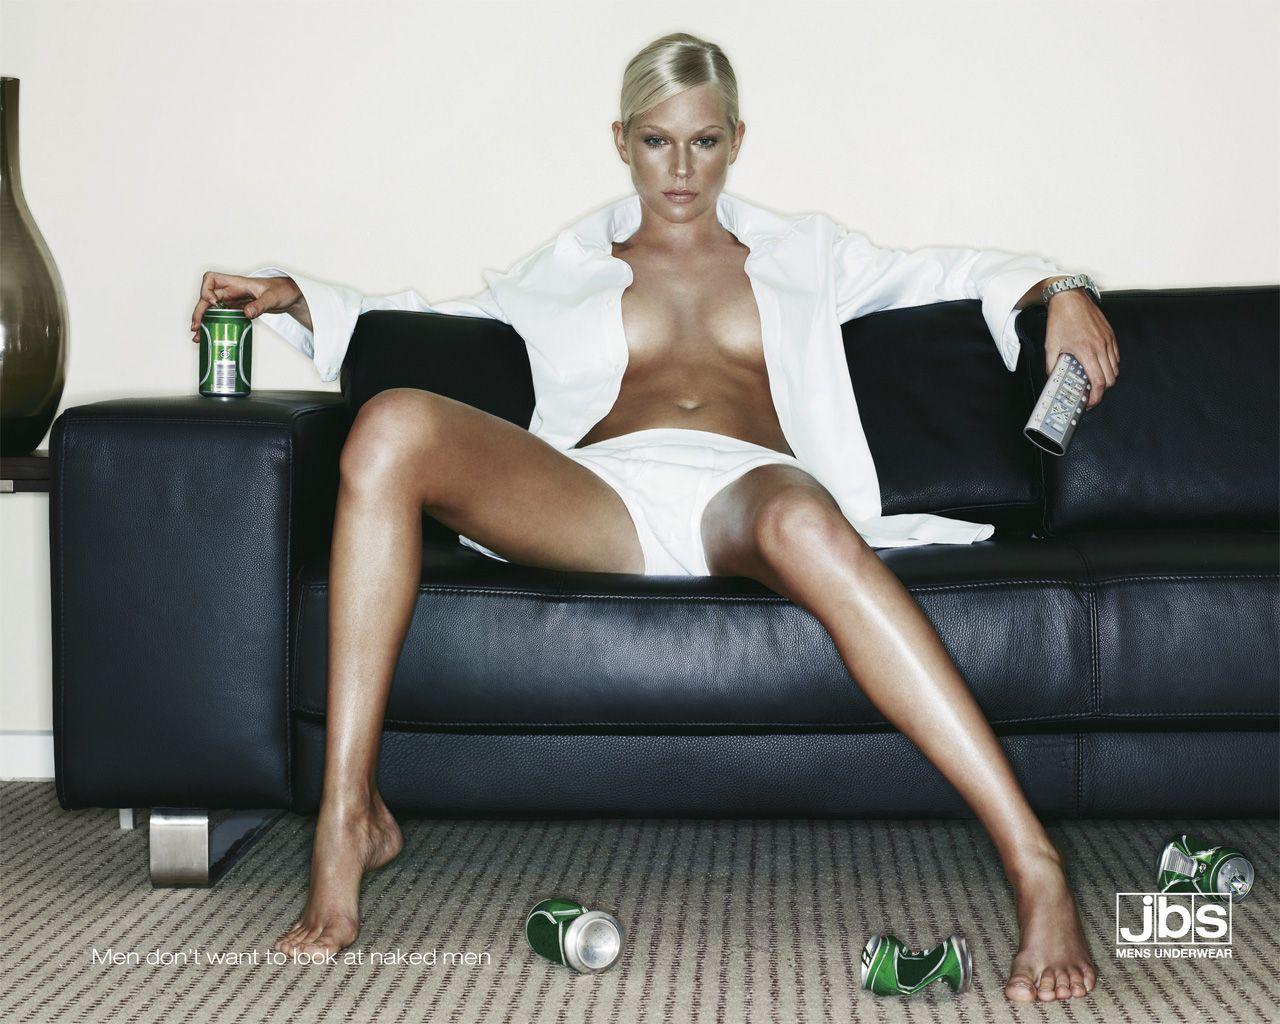 JBS Men's Underwear: The Couch | JBS | Pinterest | The o'jays ...